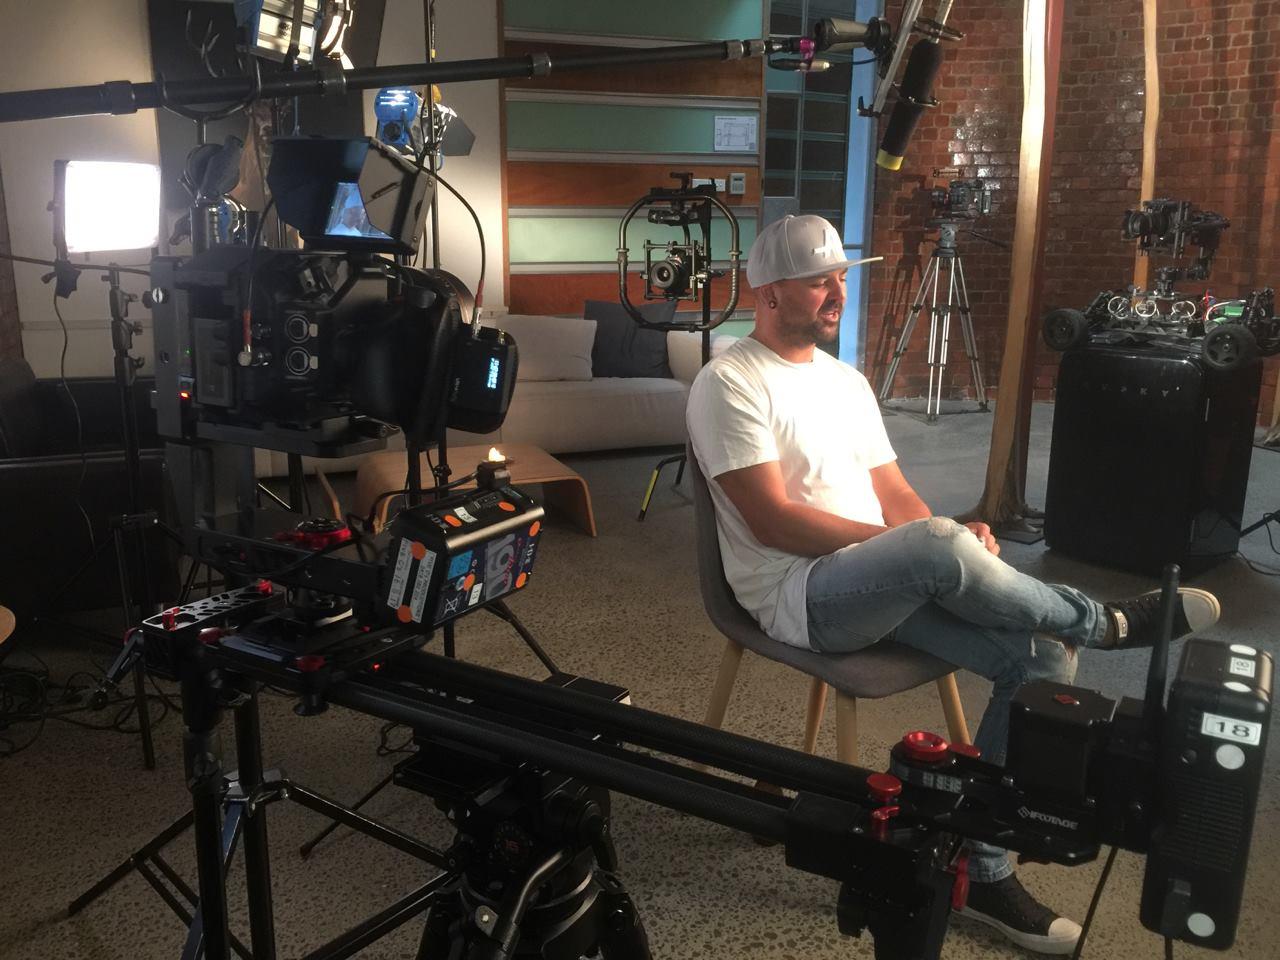 UltraSync ONE on set with Radar Kane and Con Filippidis